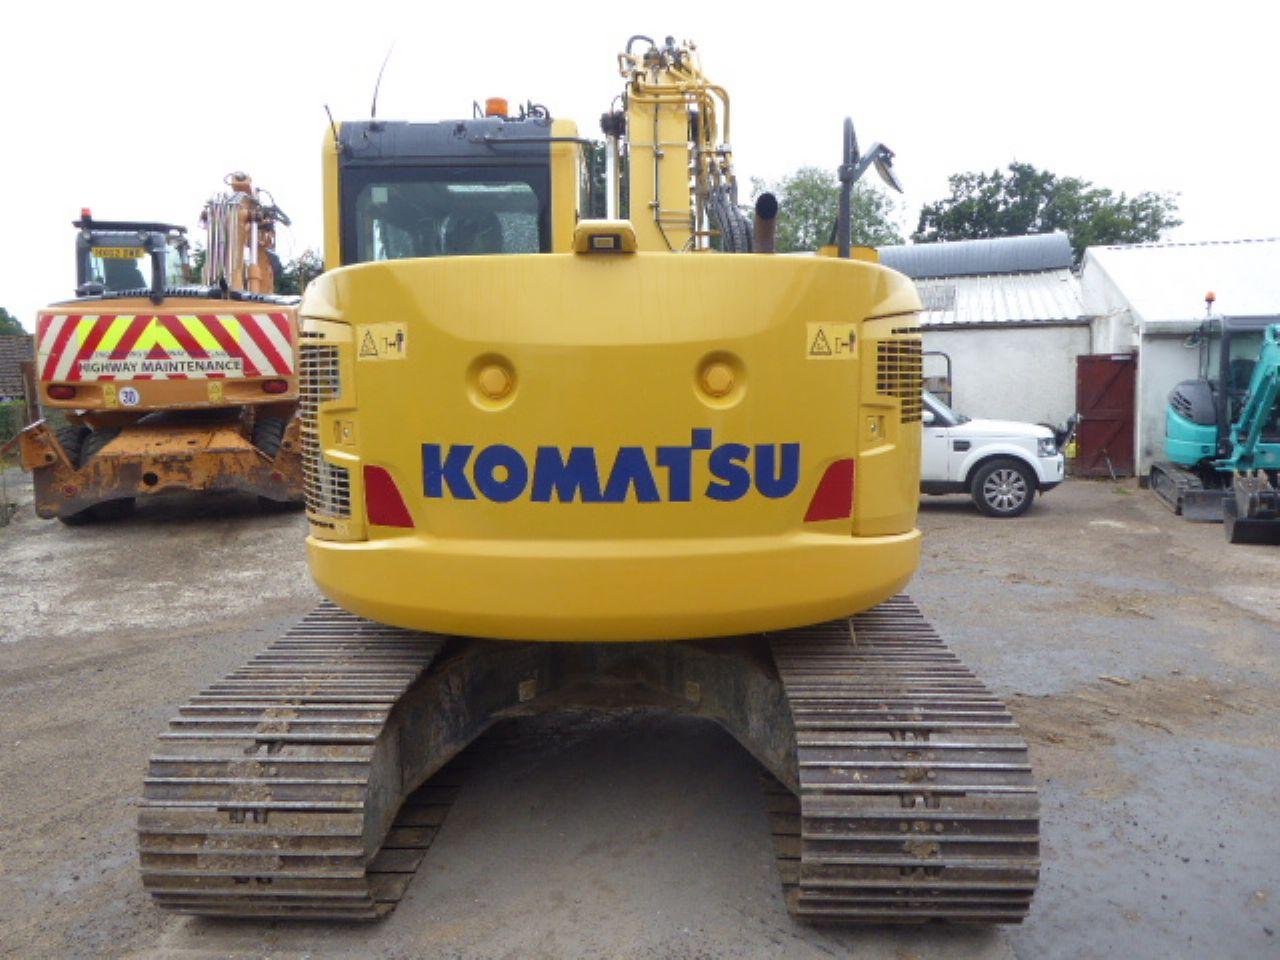 KOMATSU PC138US-10 EXCAVATOR - Picture 2